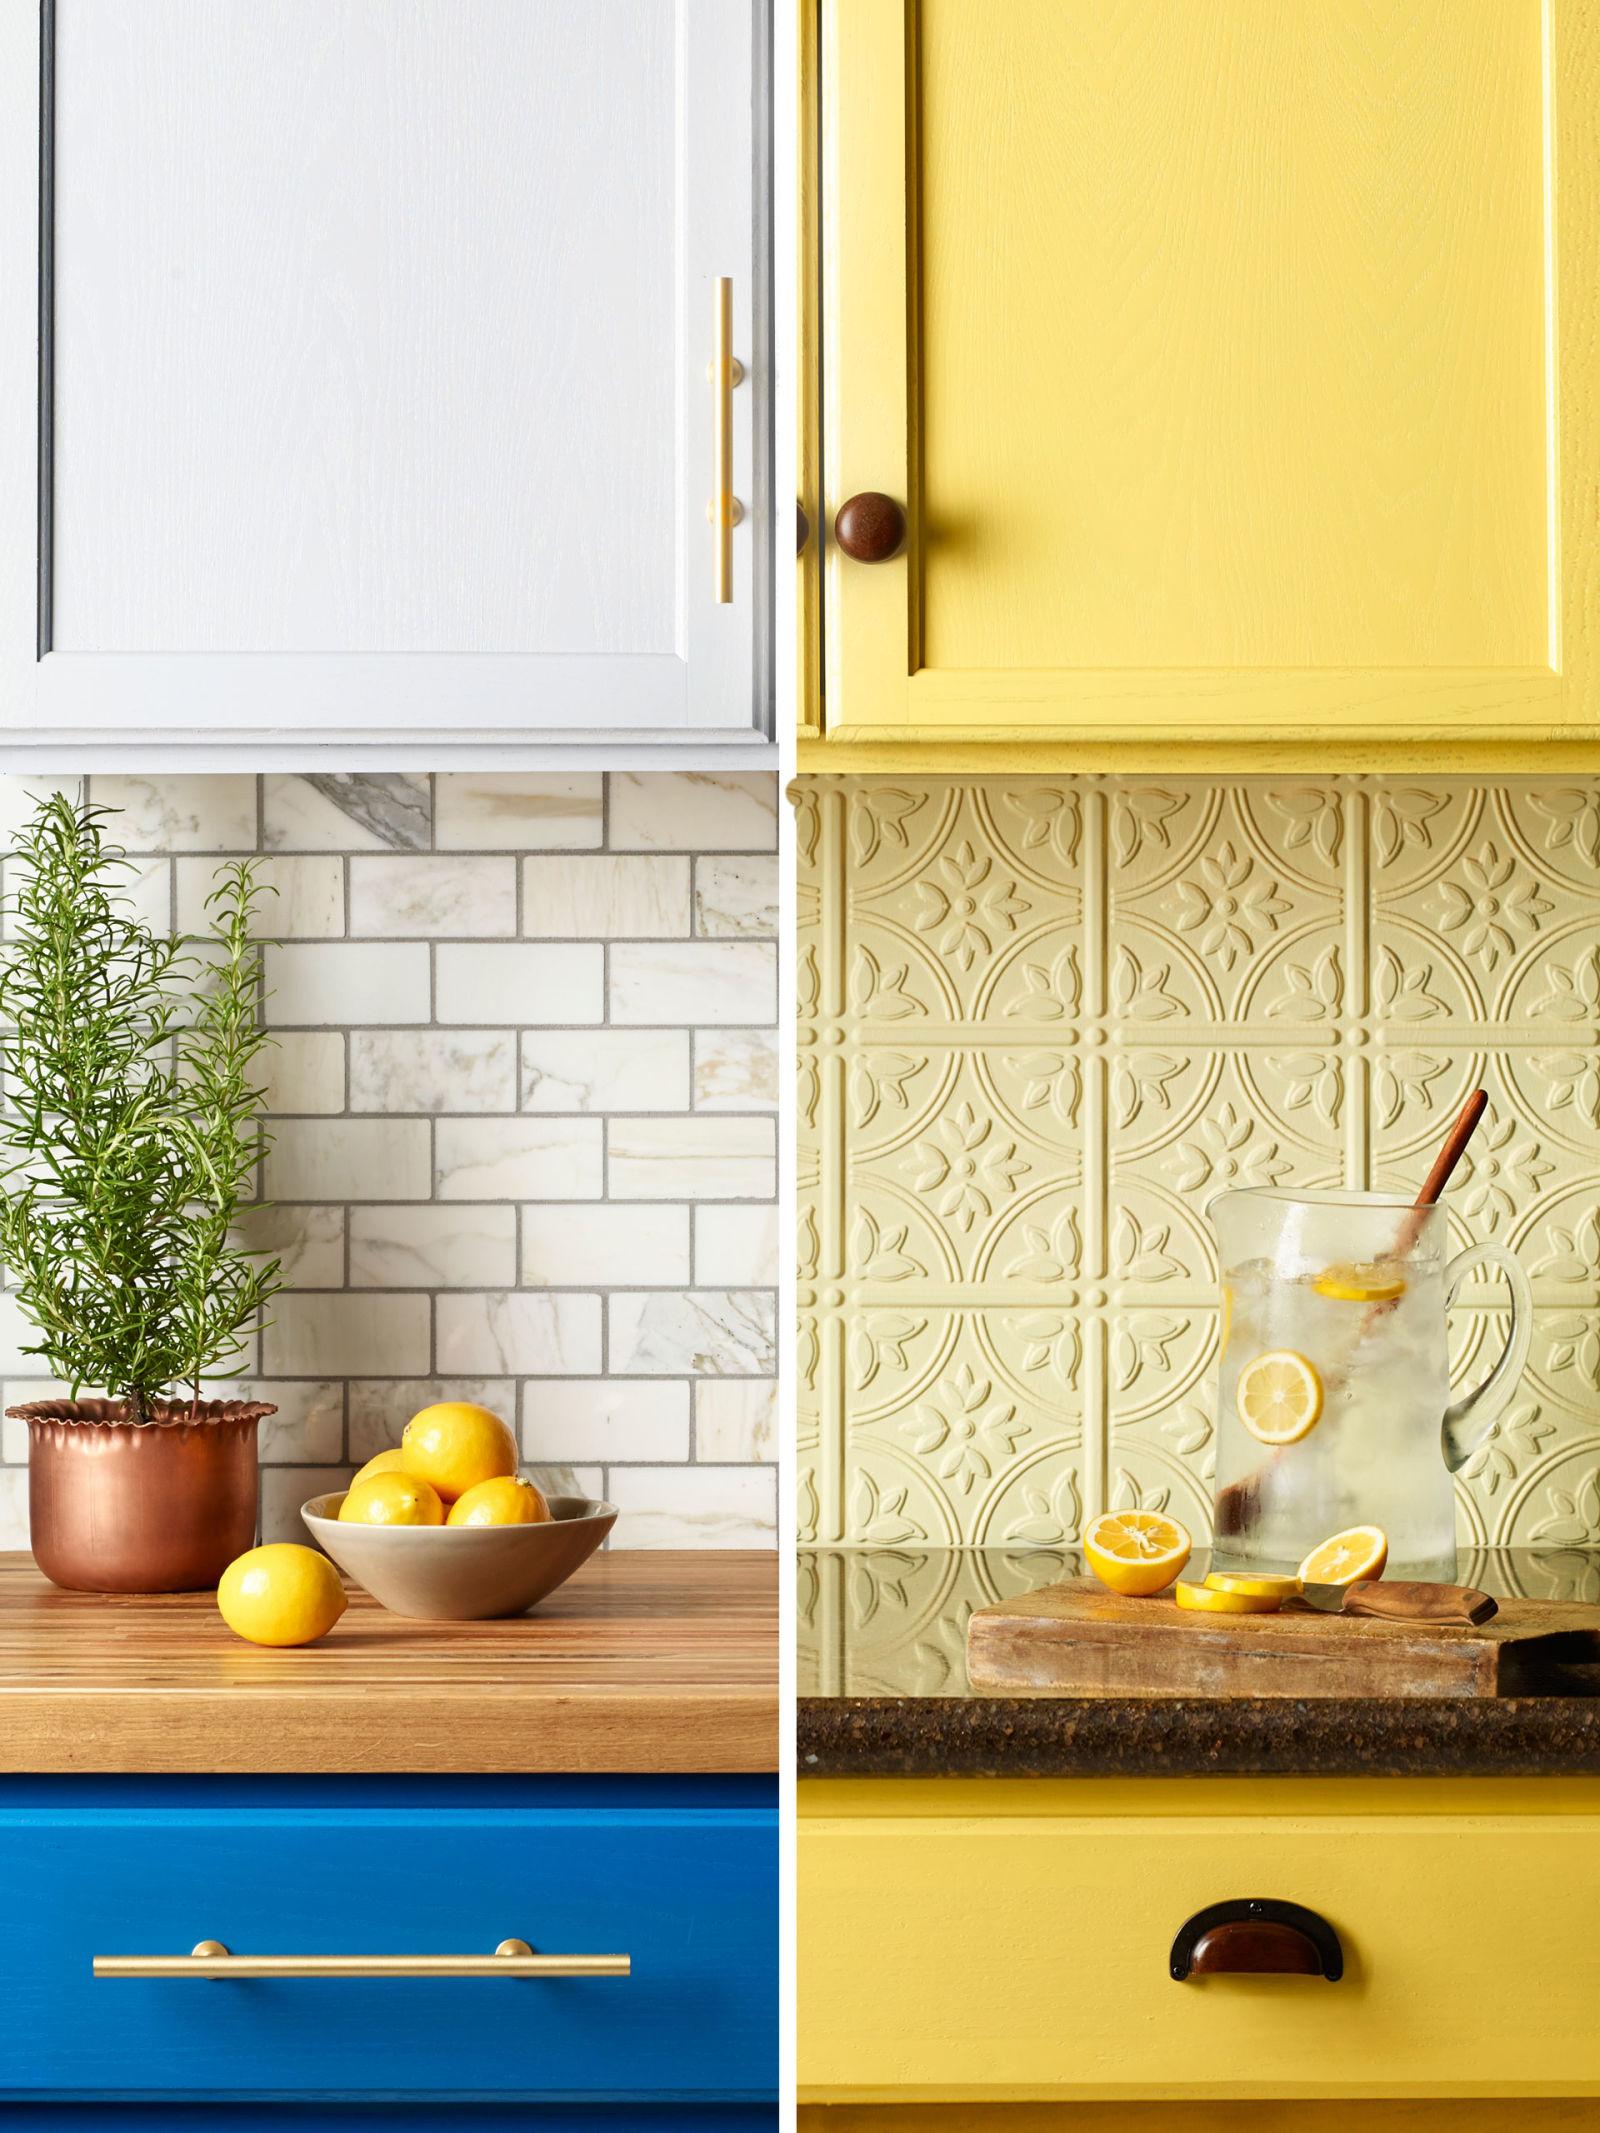 Cheap backsplash tiles